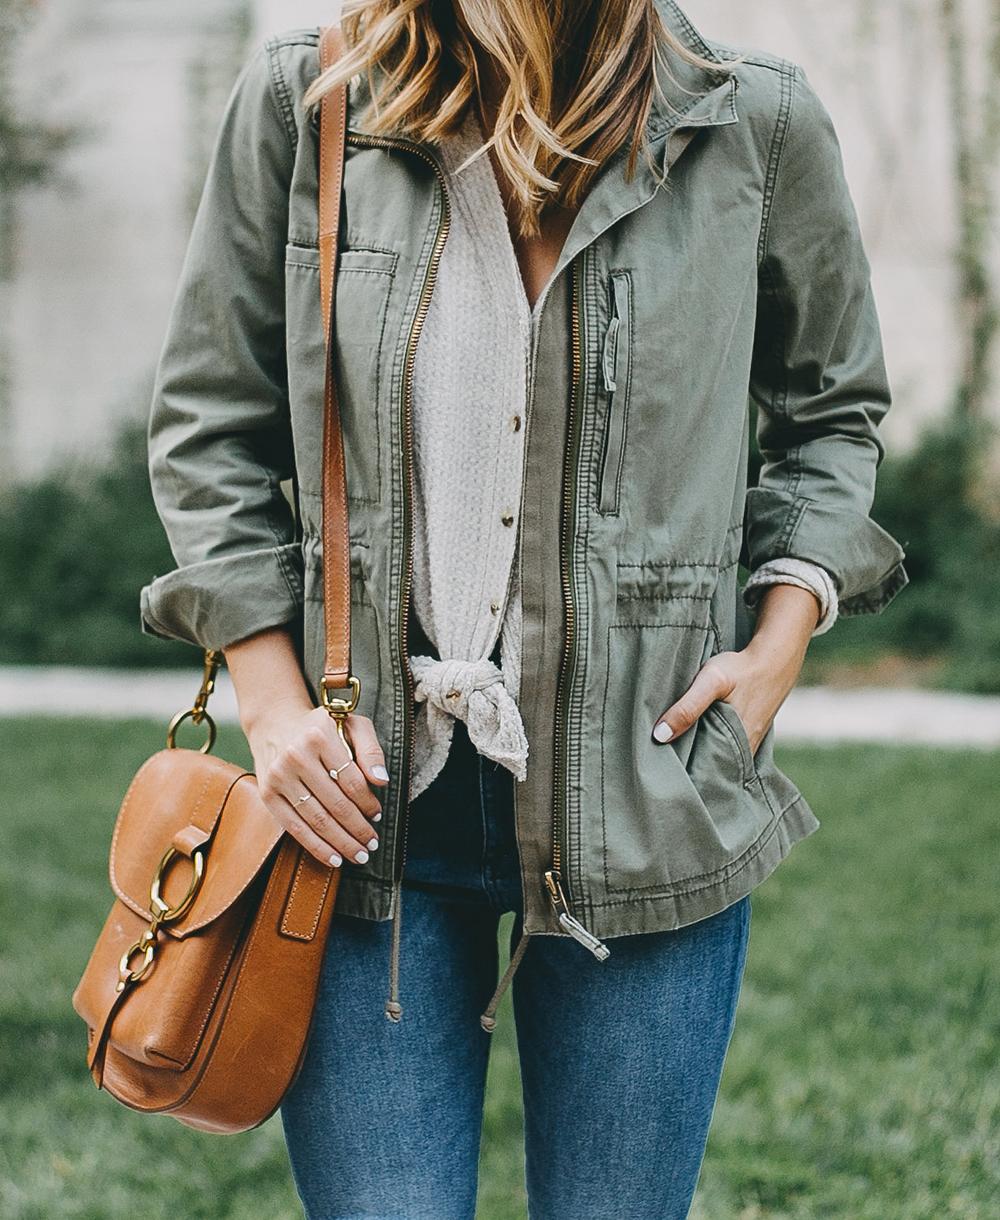 livvyland-blog-olivia-watson-austin-texas-fashion-blogger-minnatonka-moccasins-tan-suede-ankle-booties-madewell-utility-fleet-jacket-12